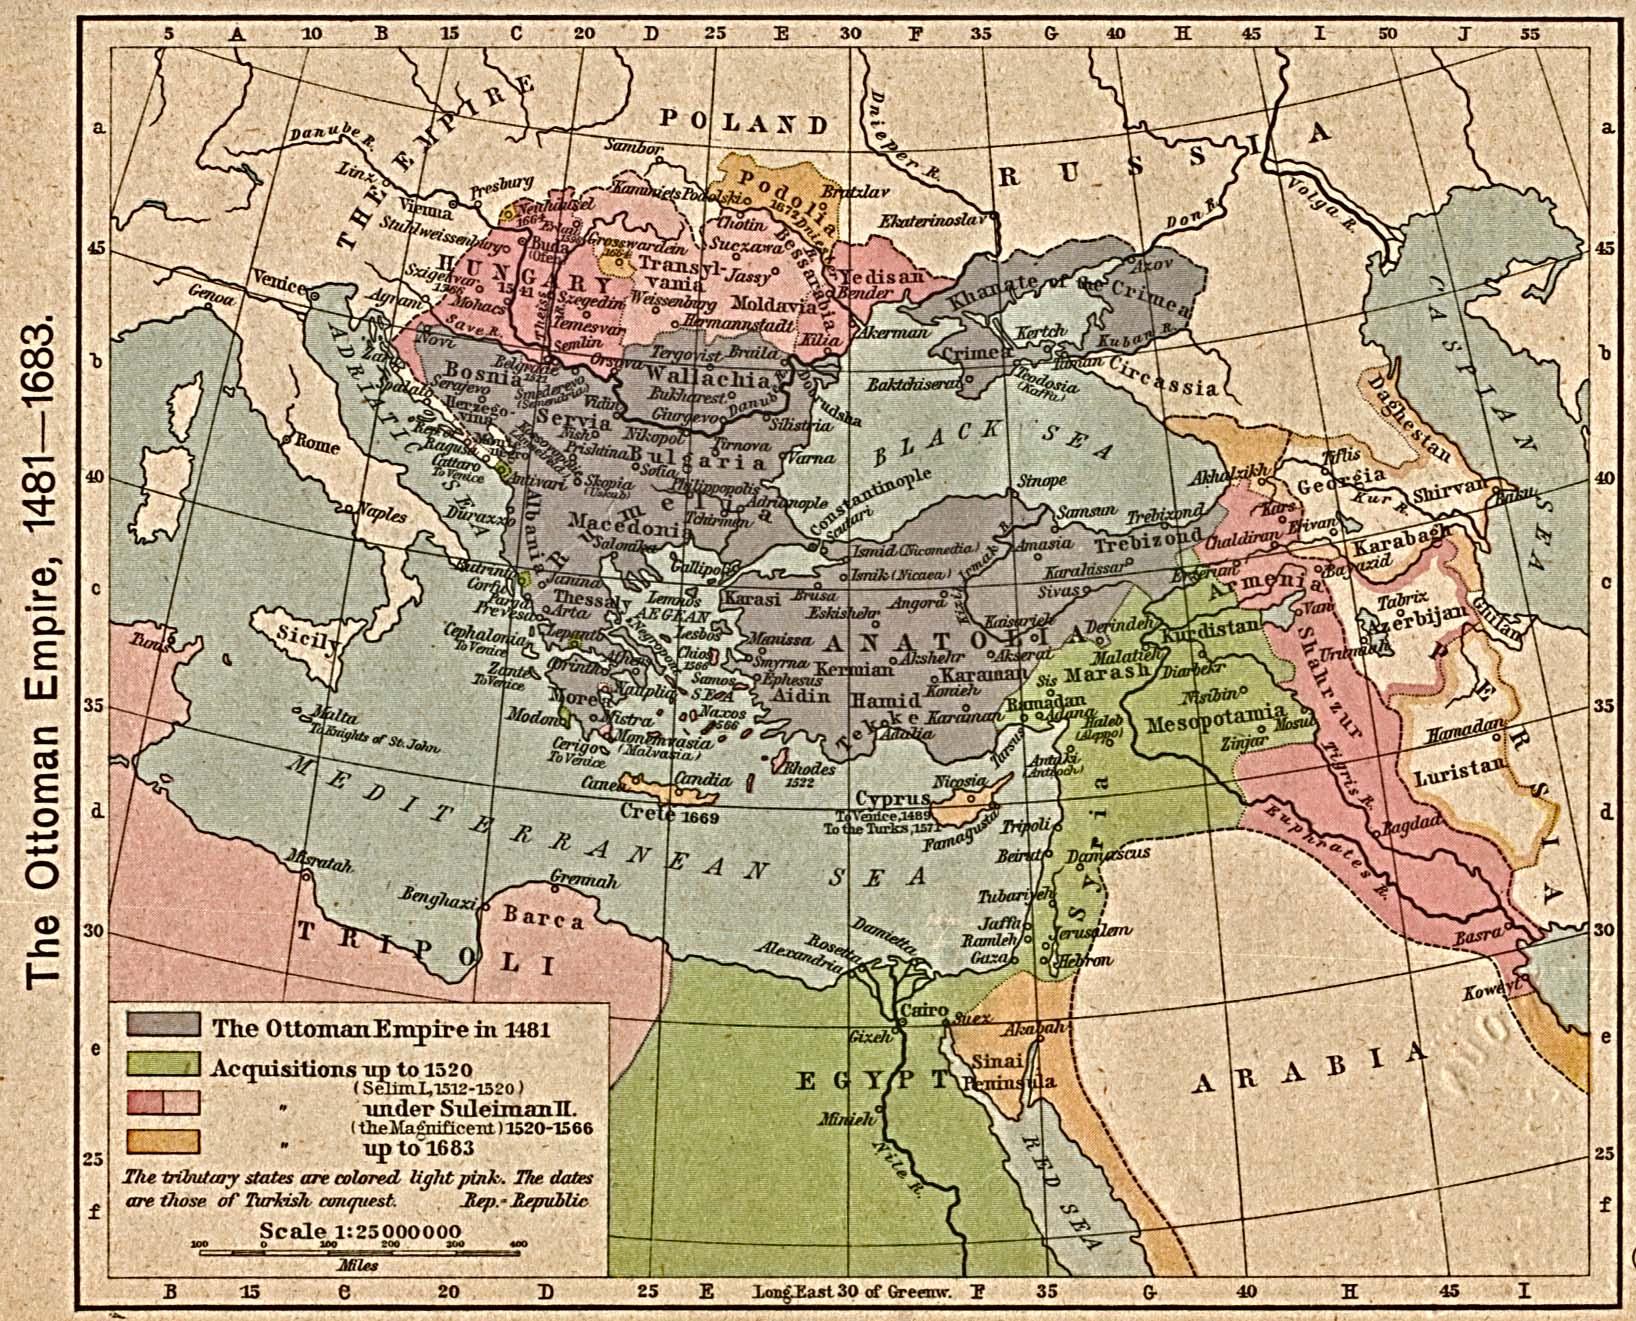 The Ottoman Empire, 1481-1683